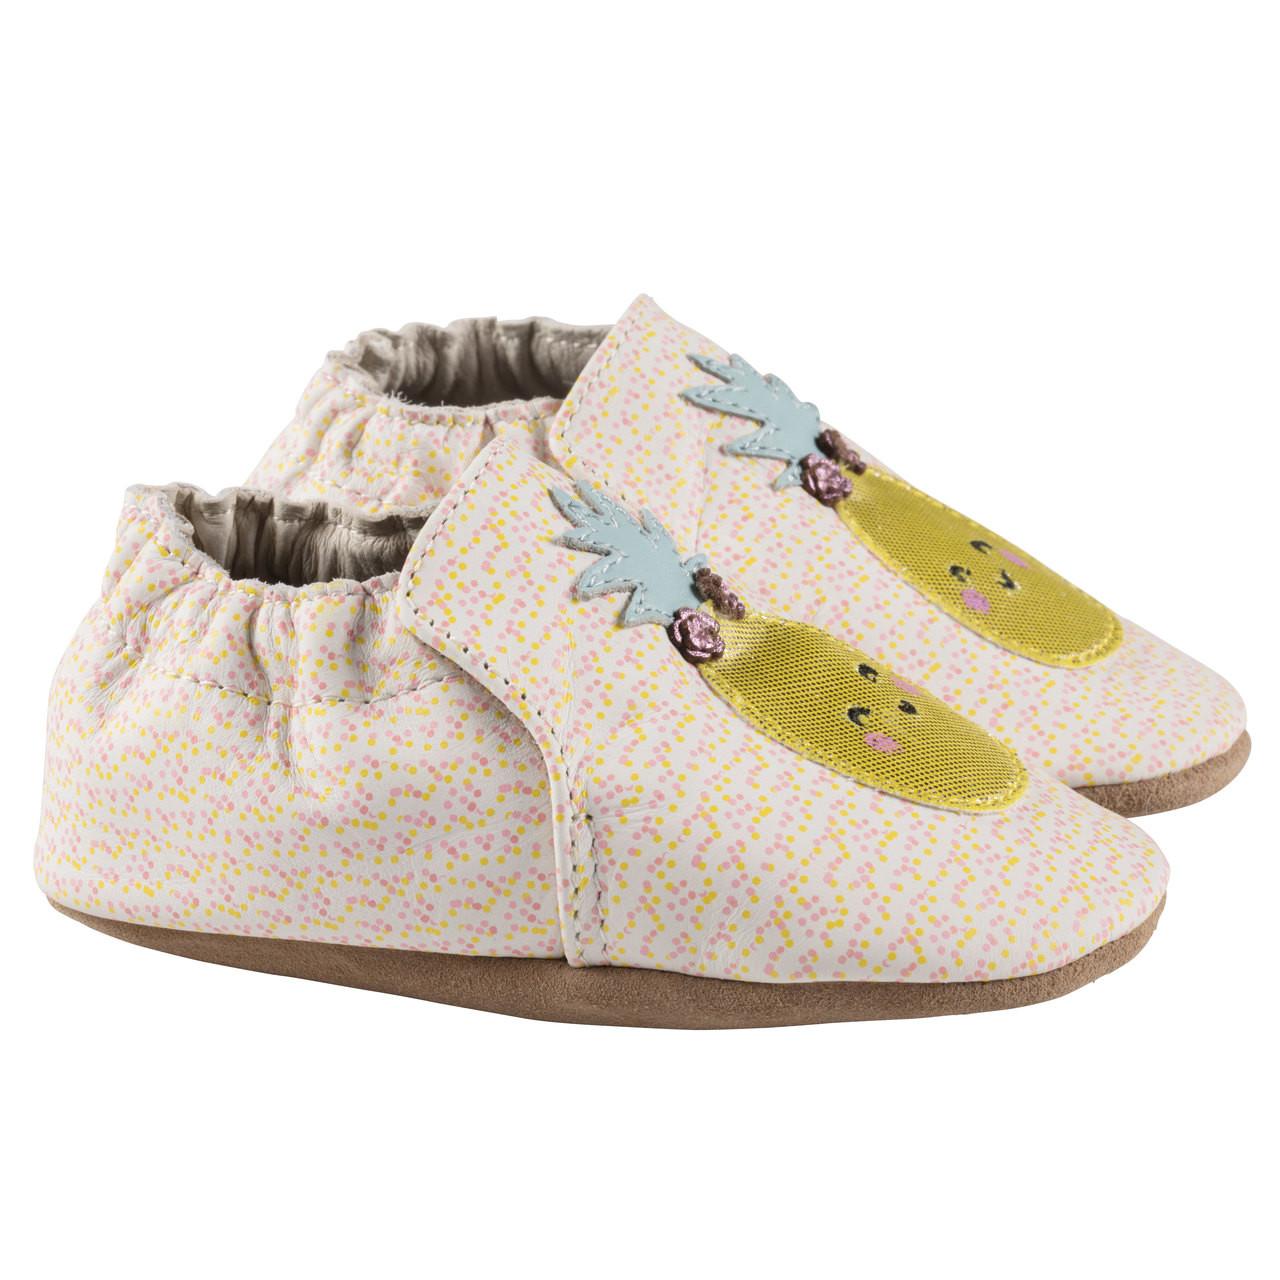 Beige Happy Fruit Soft Soles Baby Shoes Robeez